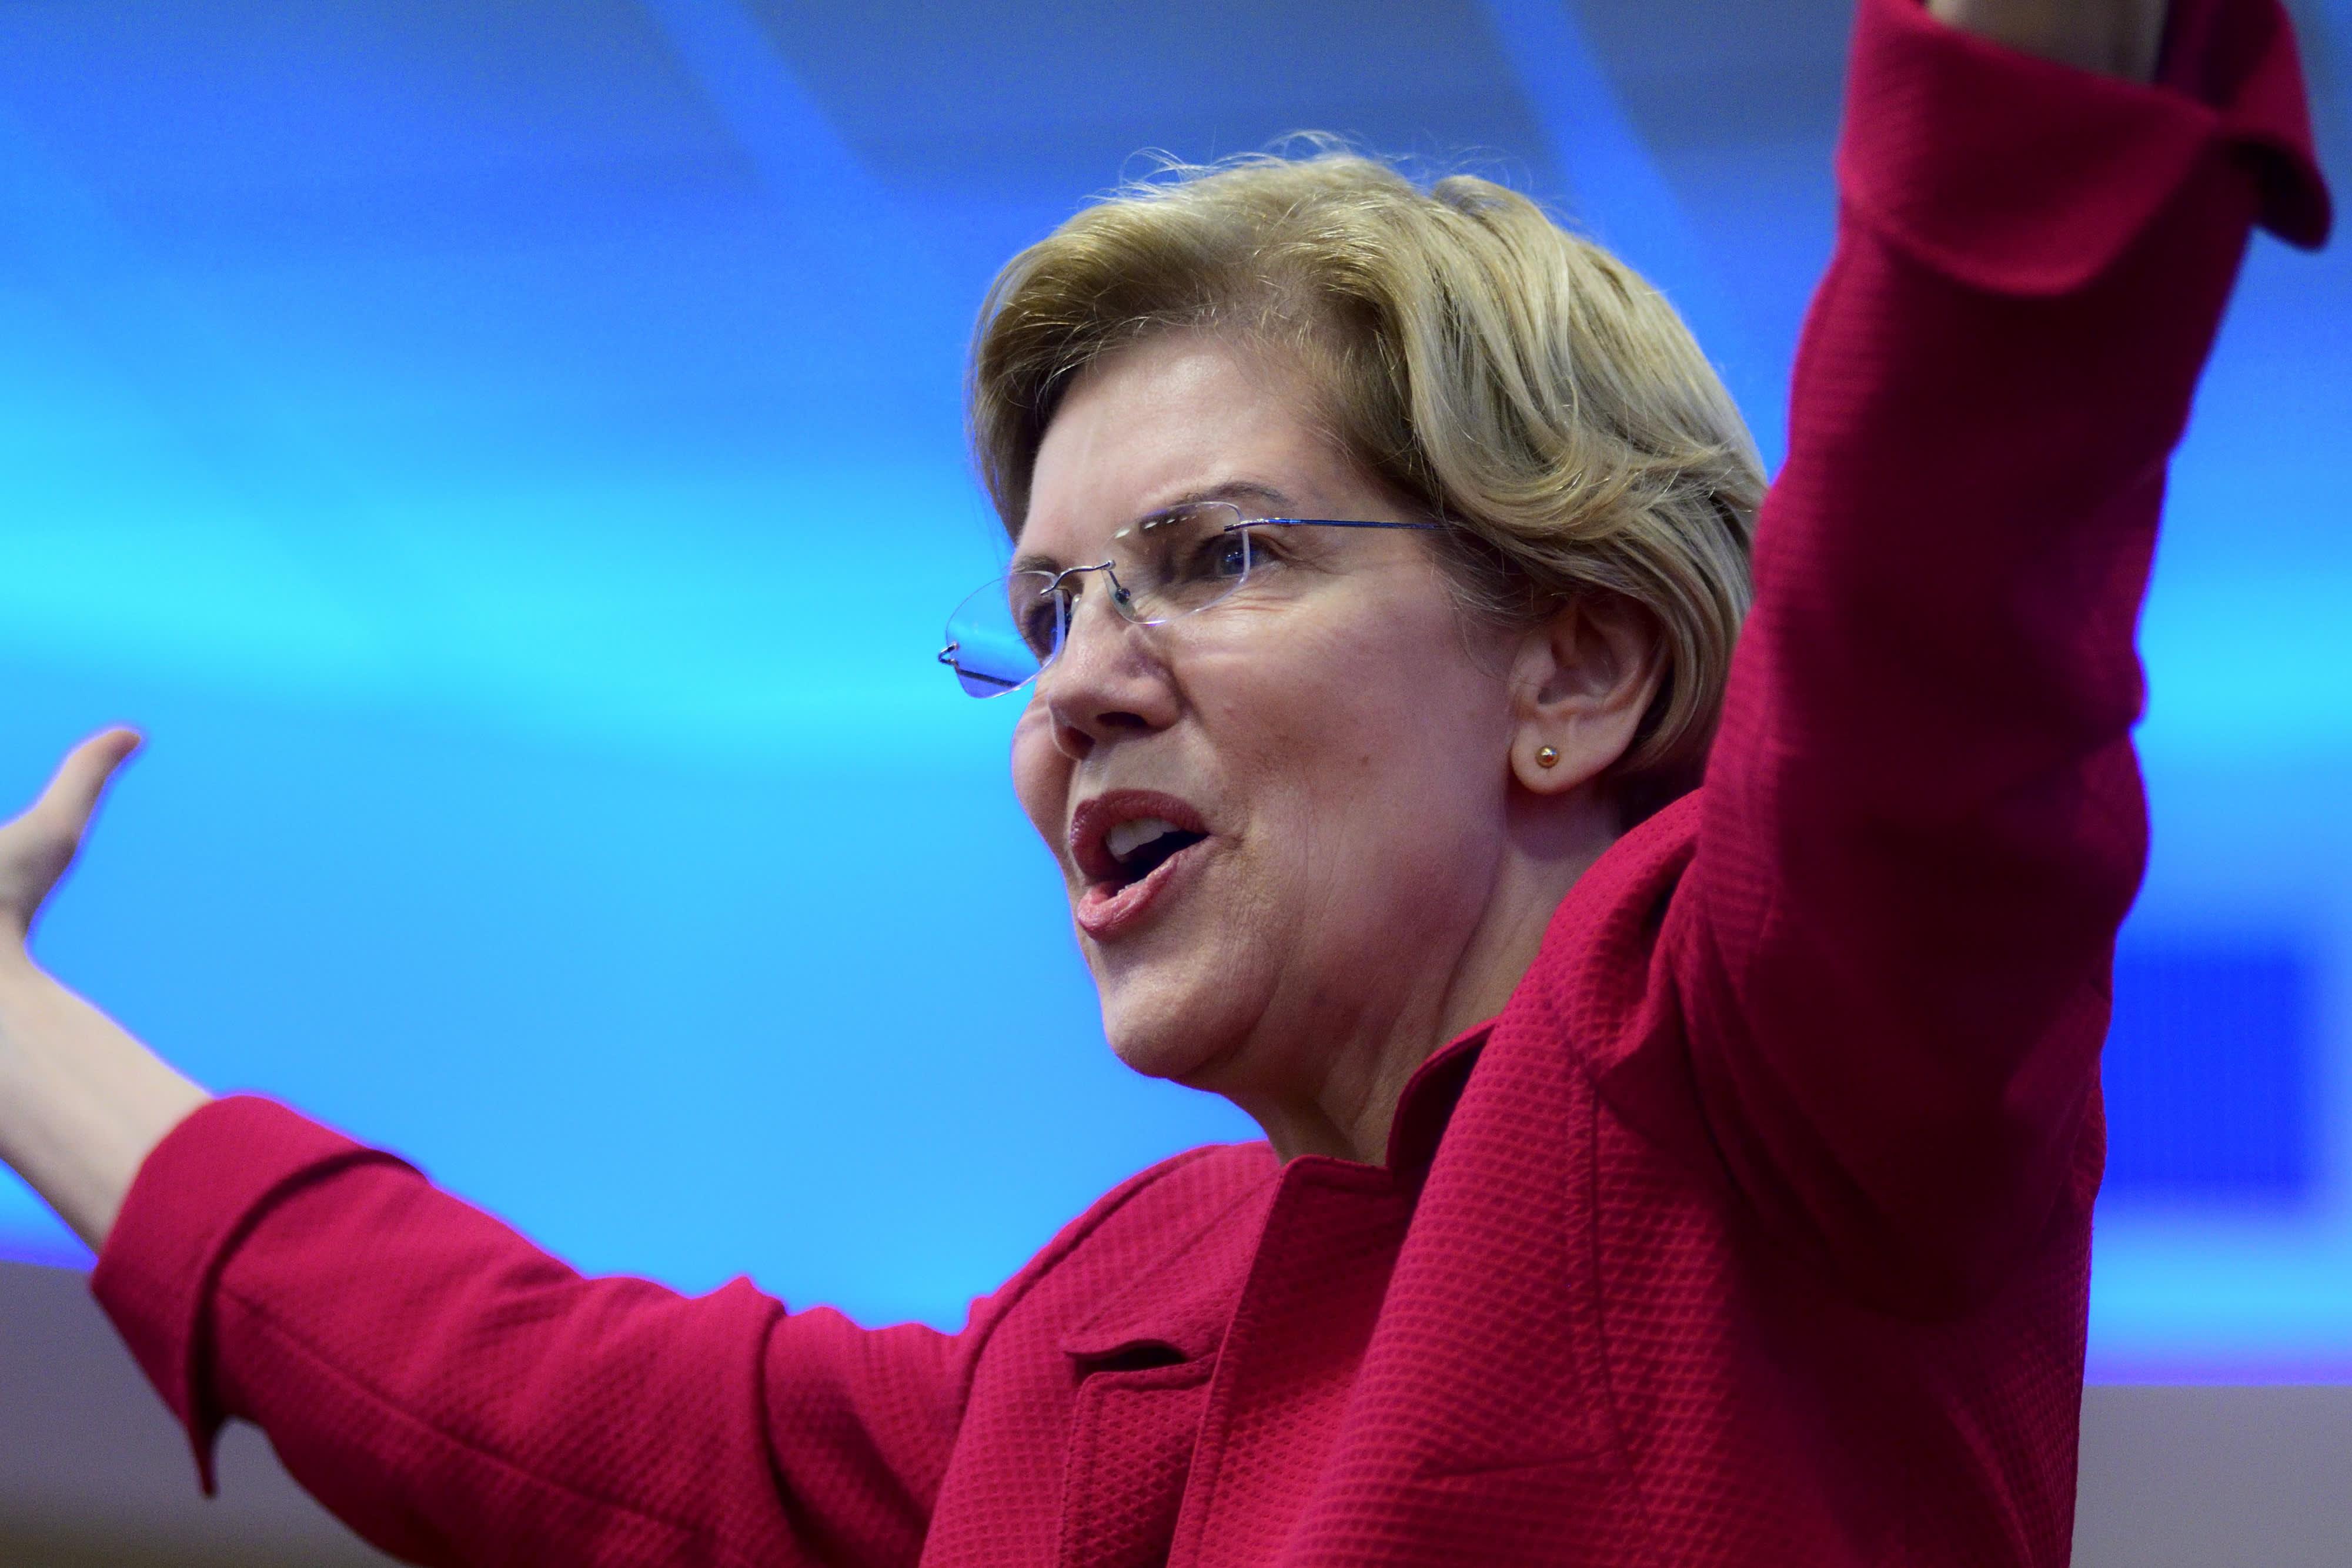 www.cnbc.com: Union divide puts Elizabeth Warren in a bind over USMCA vote as she seeks labor backing